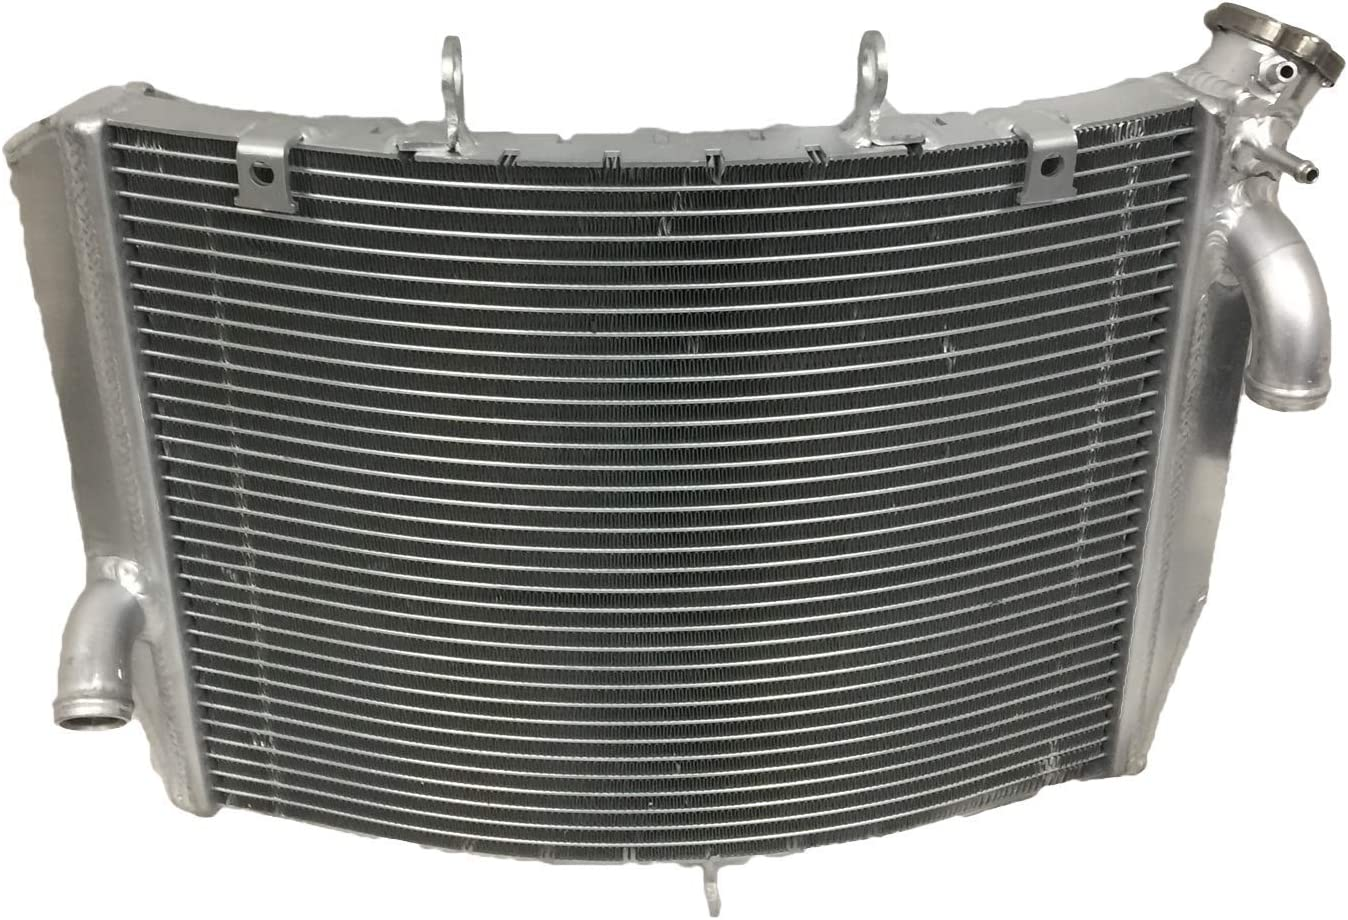 BRAND Aluminum Radiator Engine Cooling FOR Kawasaki Ninja ZX6R ZX-6R 2007 2008